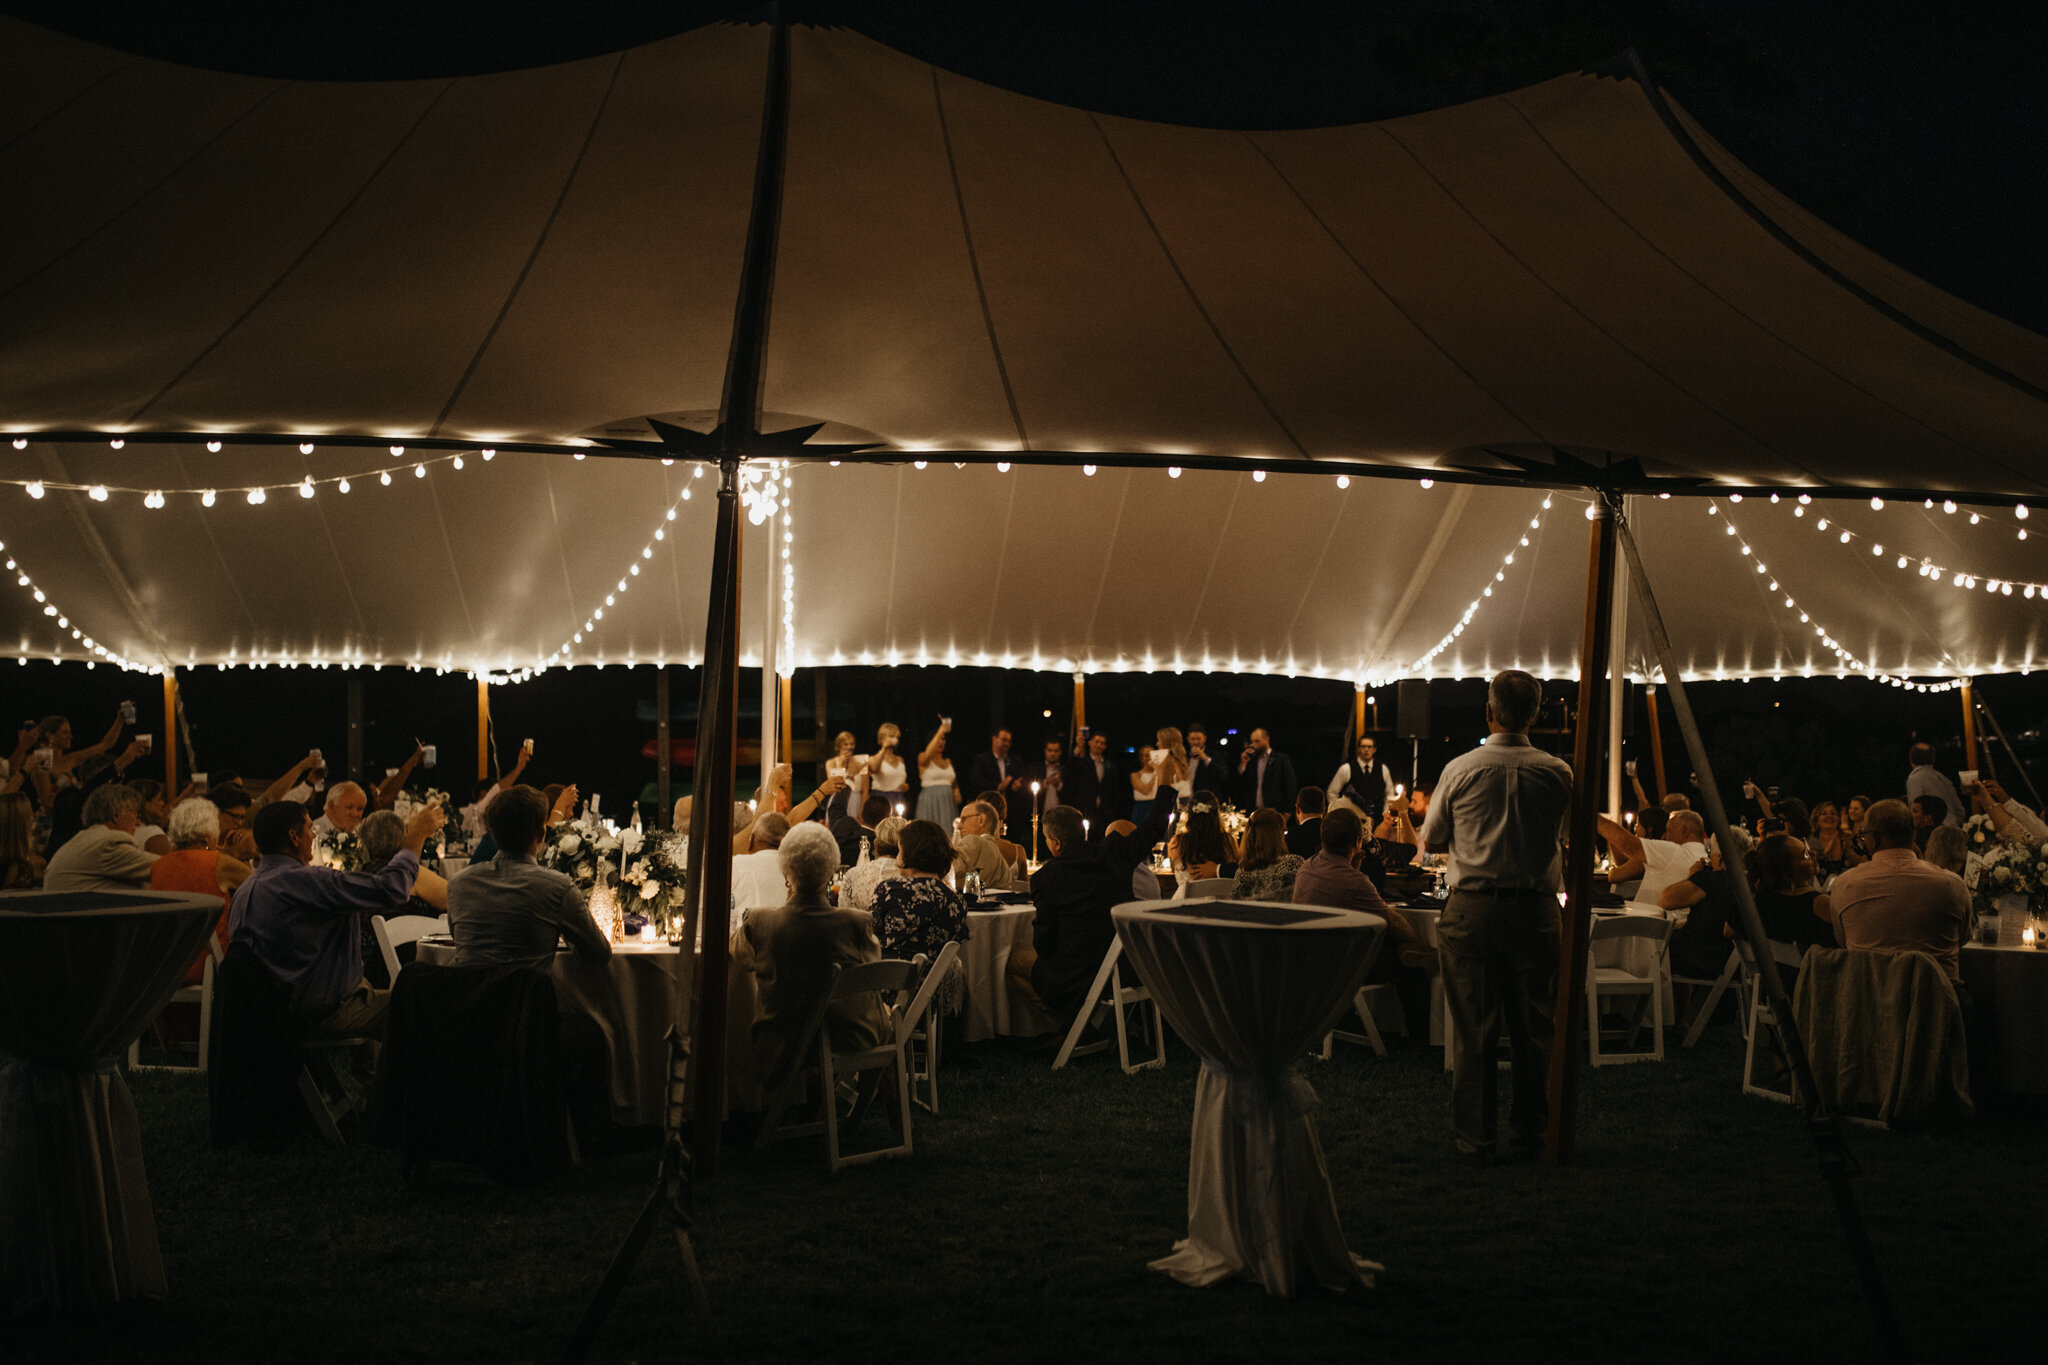 angela_jason_norfolk_wedding-156.jpg